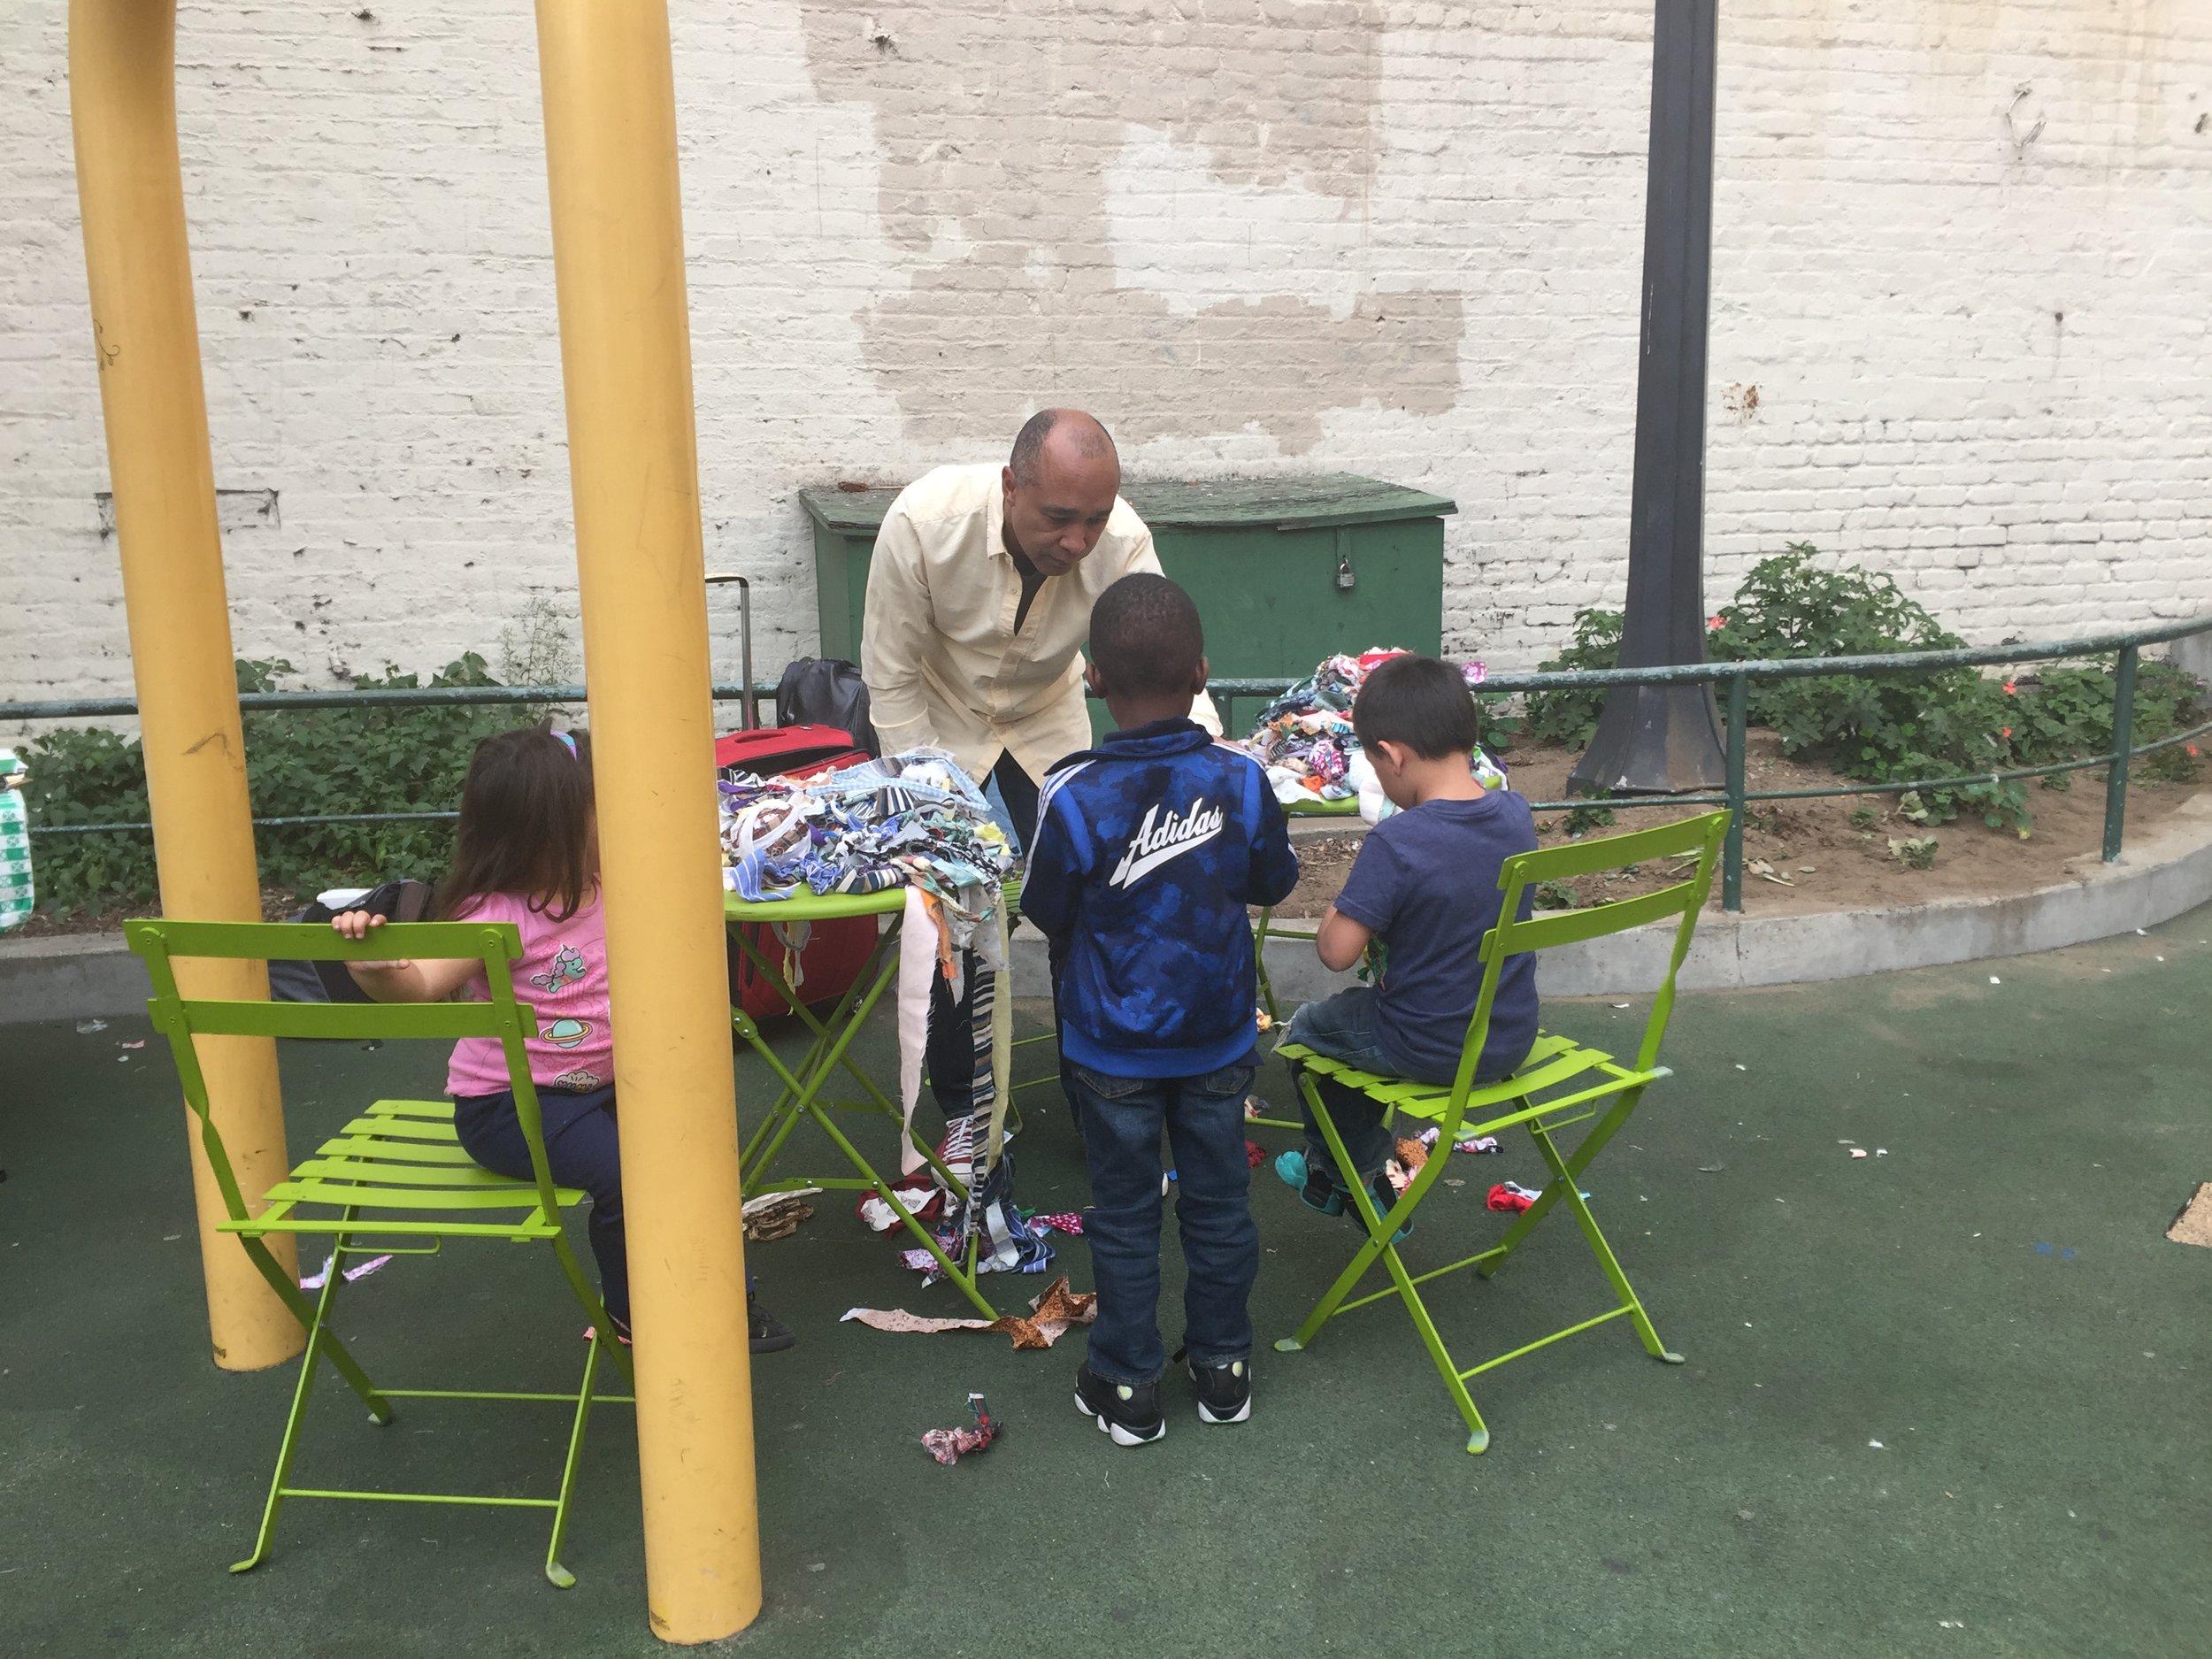 Ramekon O'Arwistersdemonstrates weaving techniques for Tenderloin youth during a recent Crochet Jam at Turk Hyde Mini Park.